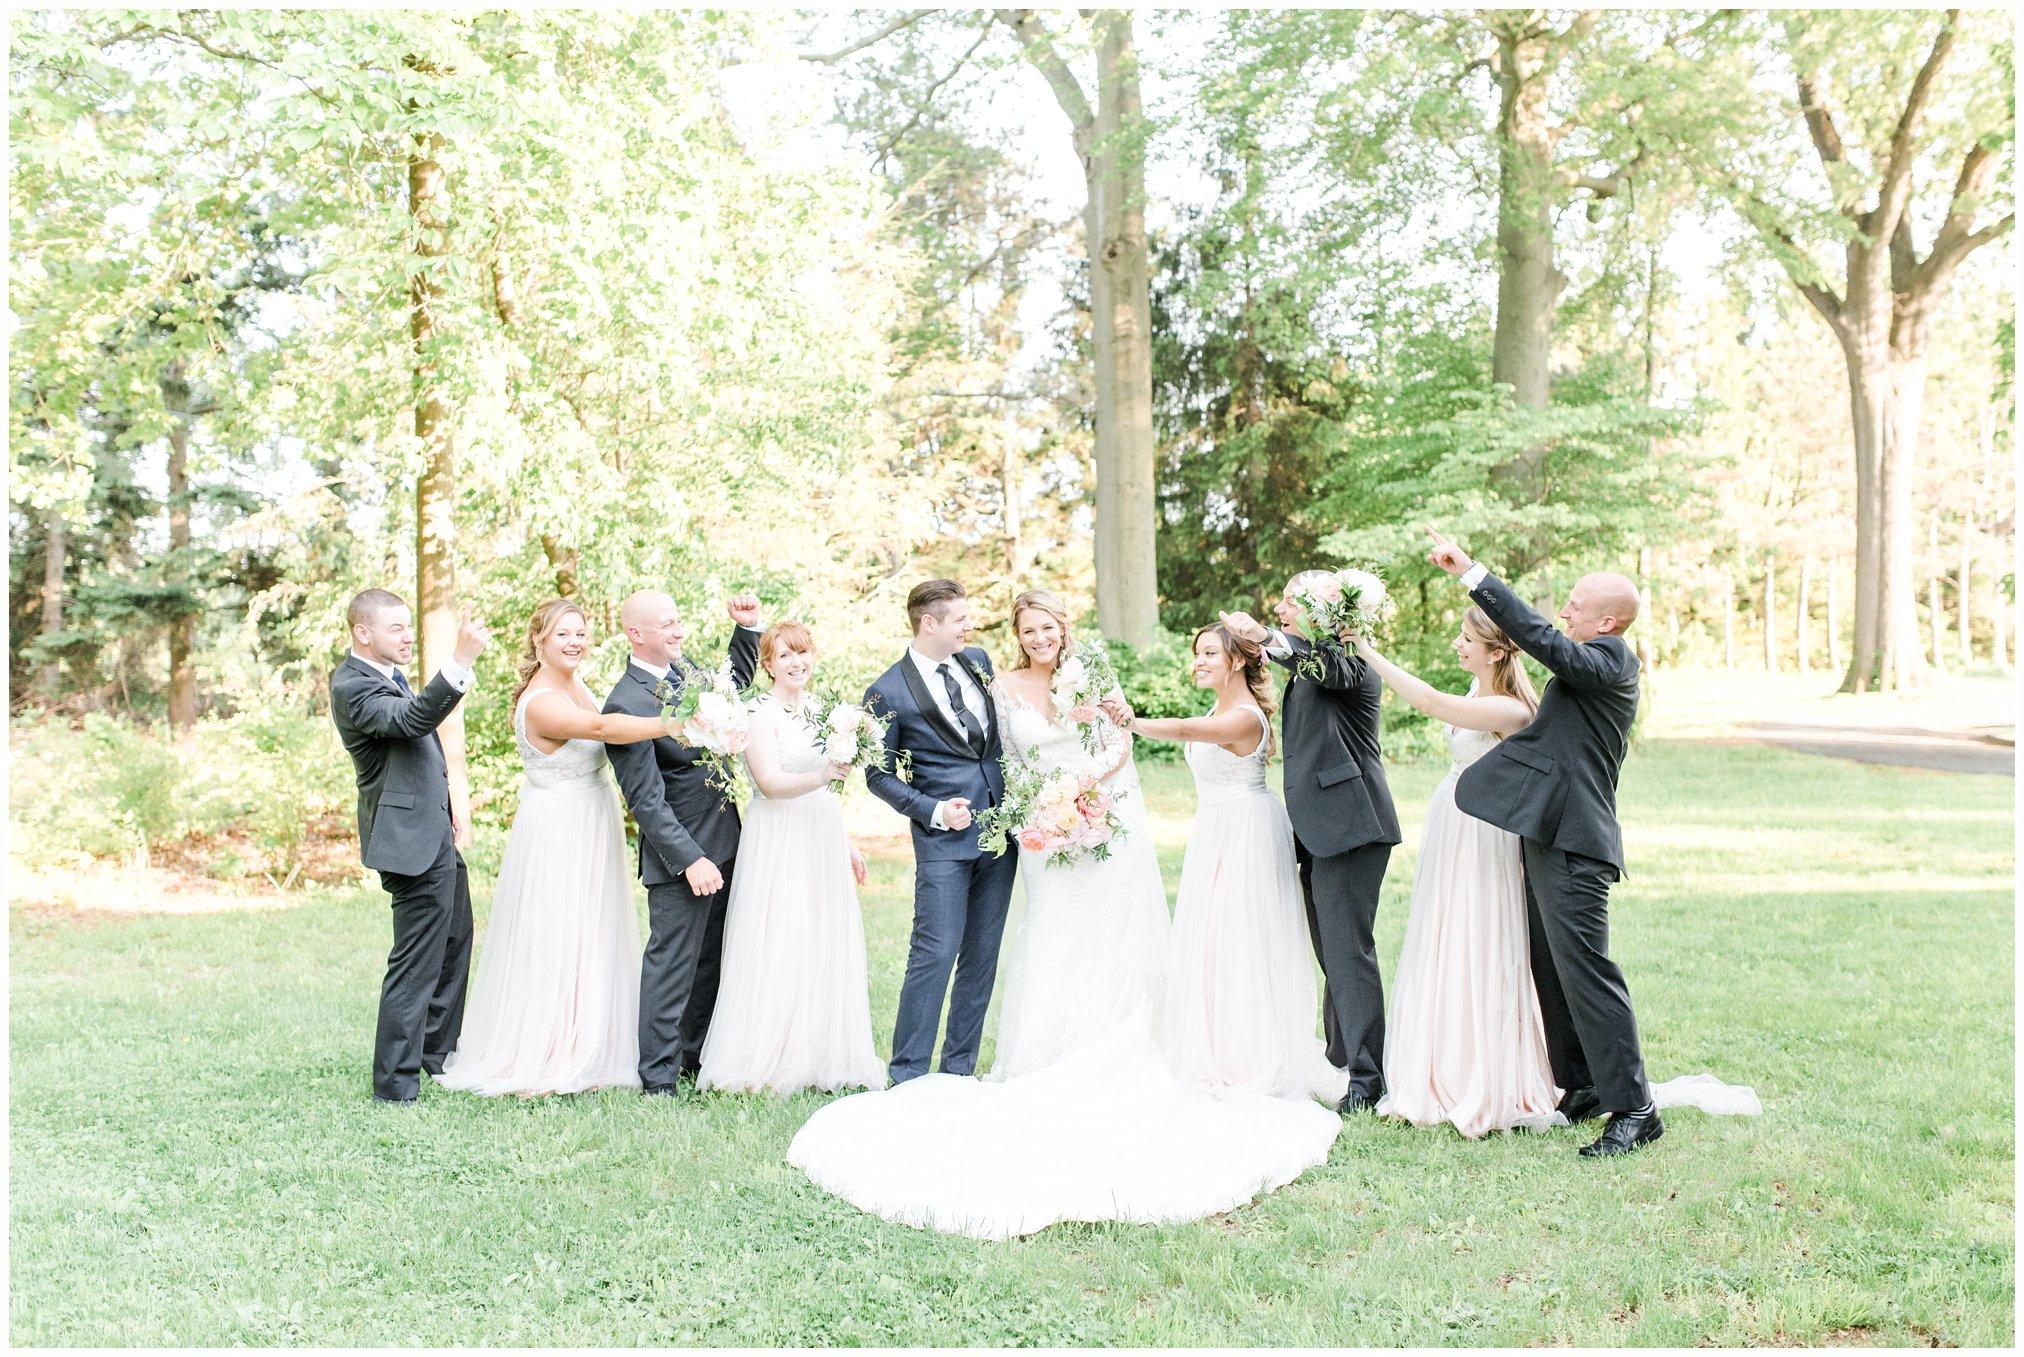 bridal party portraits at the ryland inn, whitehouse station, nj